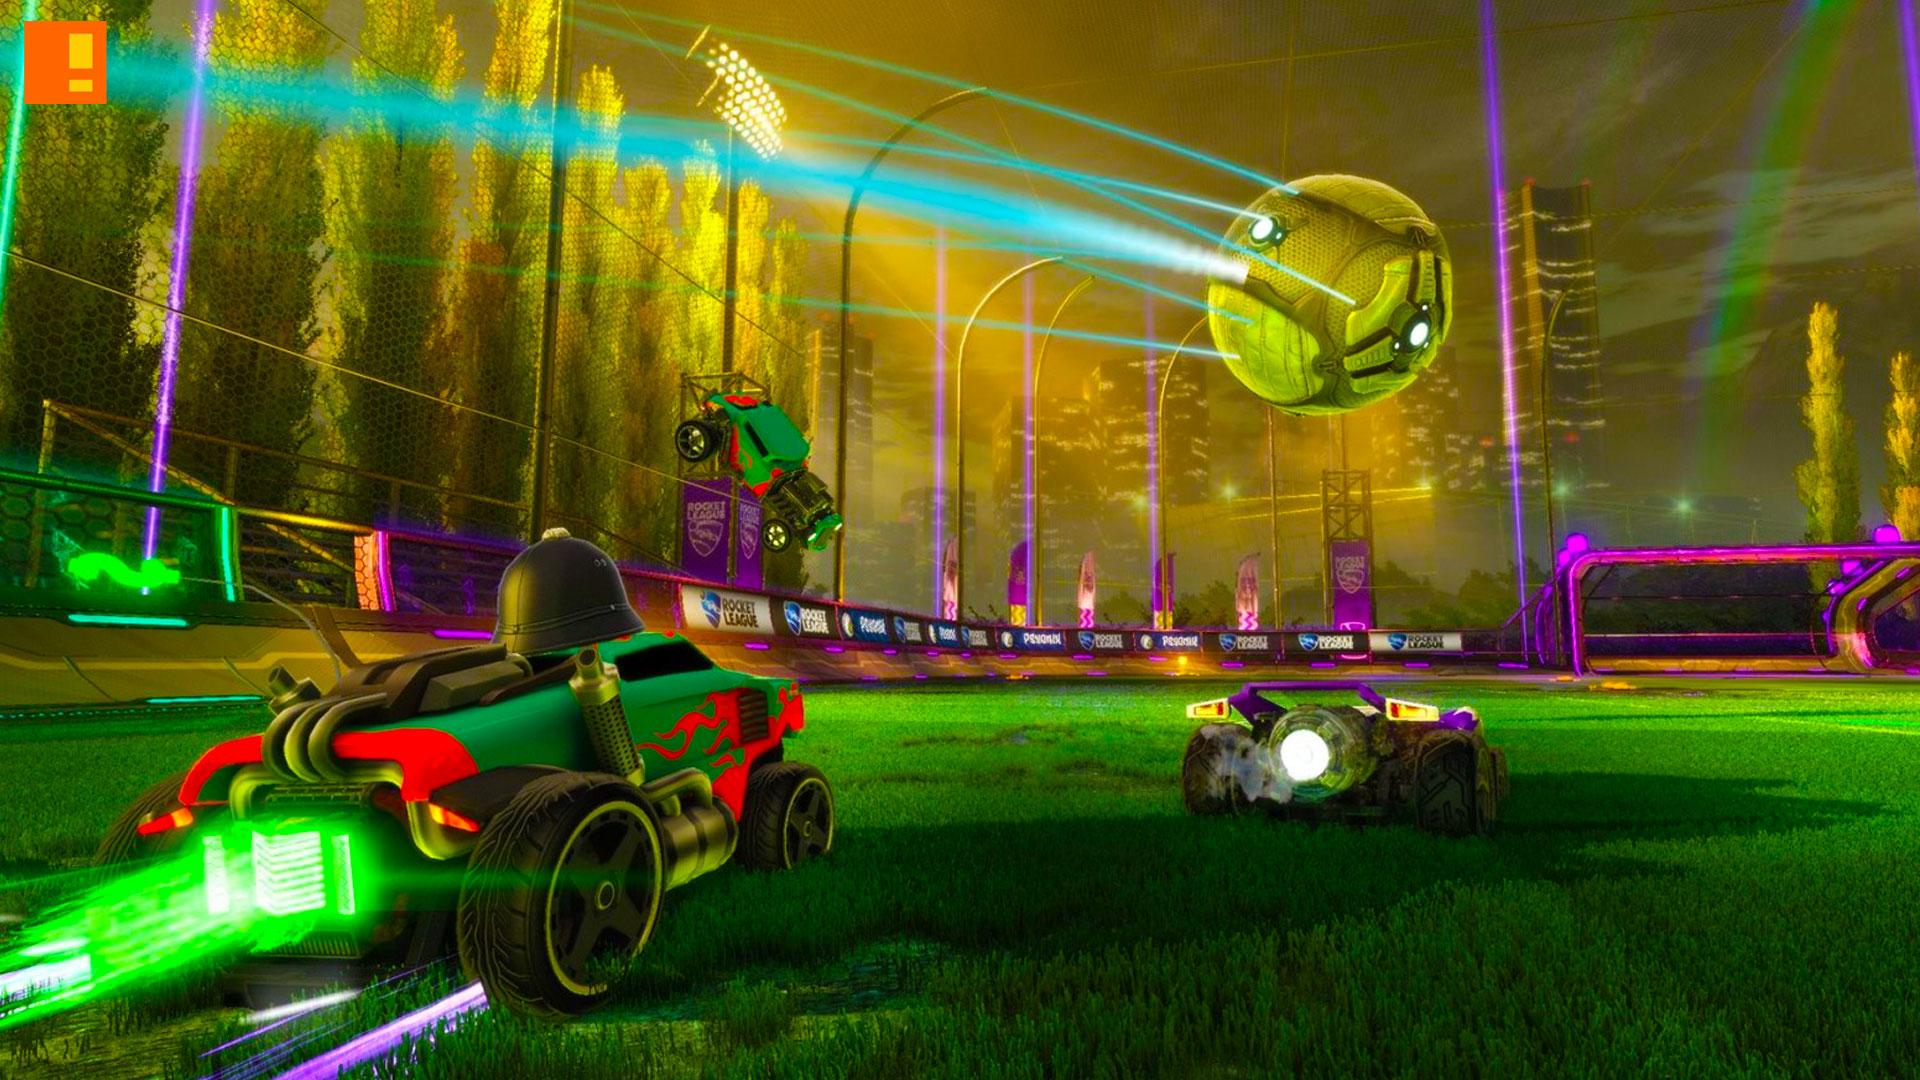 Rocket league. xbox. the action pixel. @theactionpixel. psyonix.